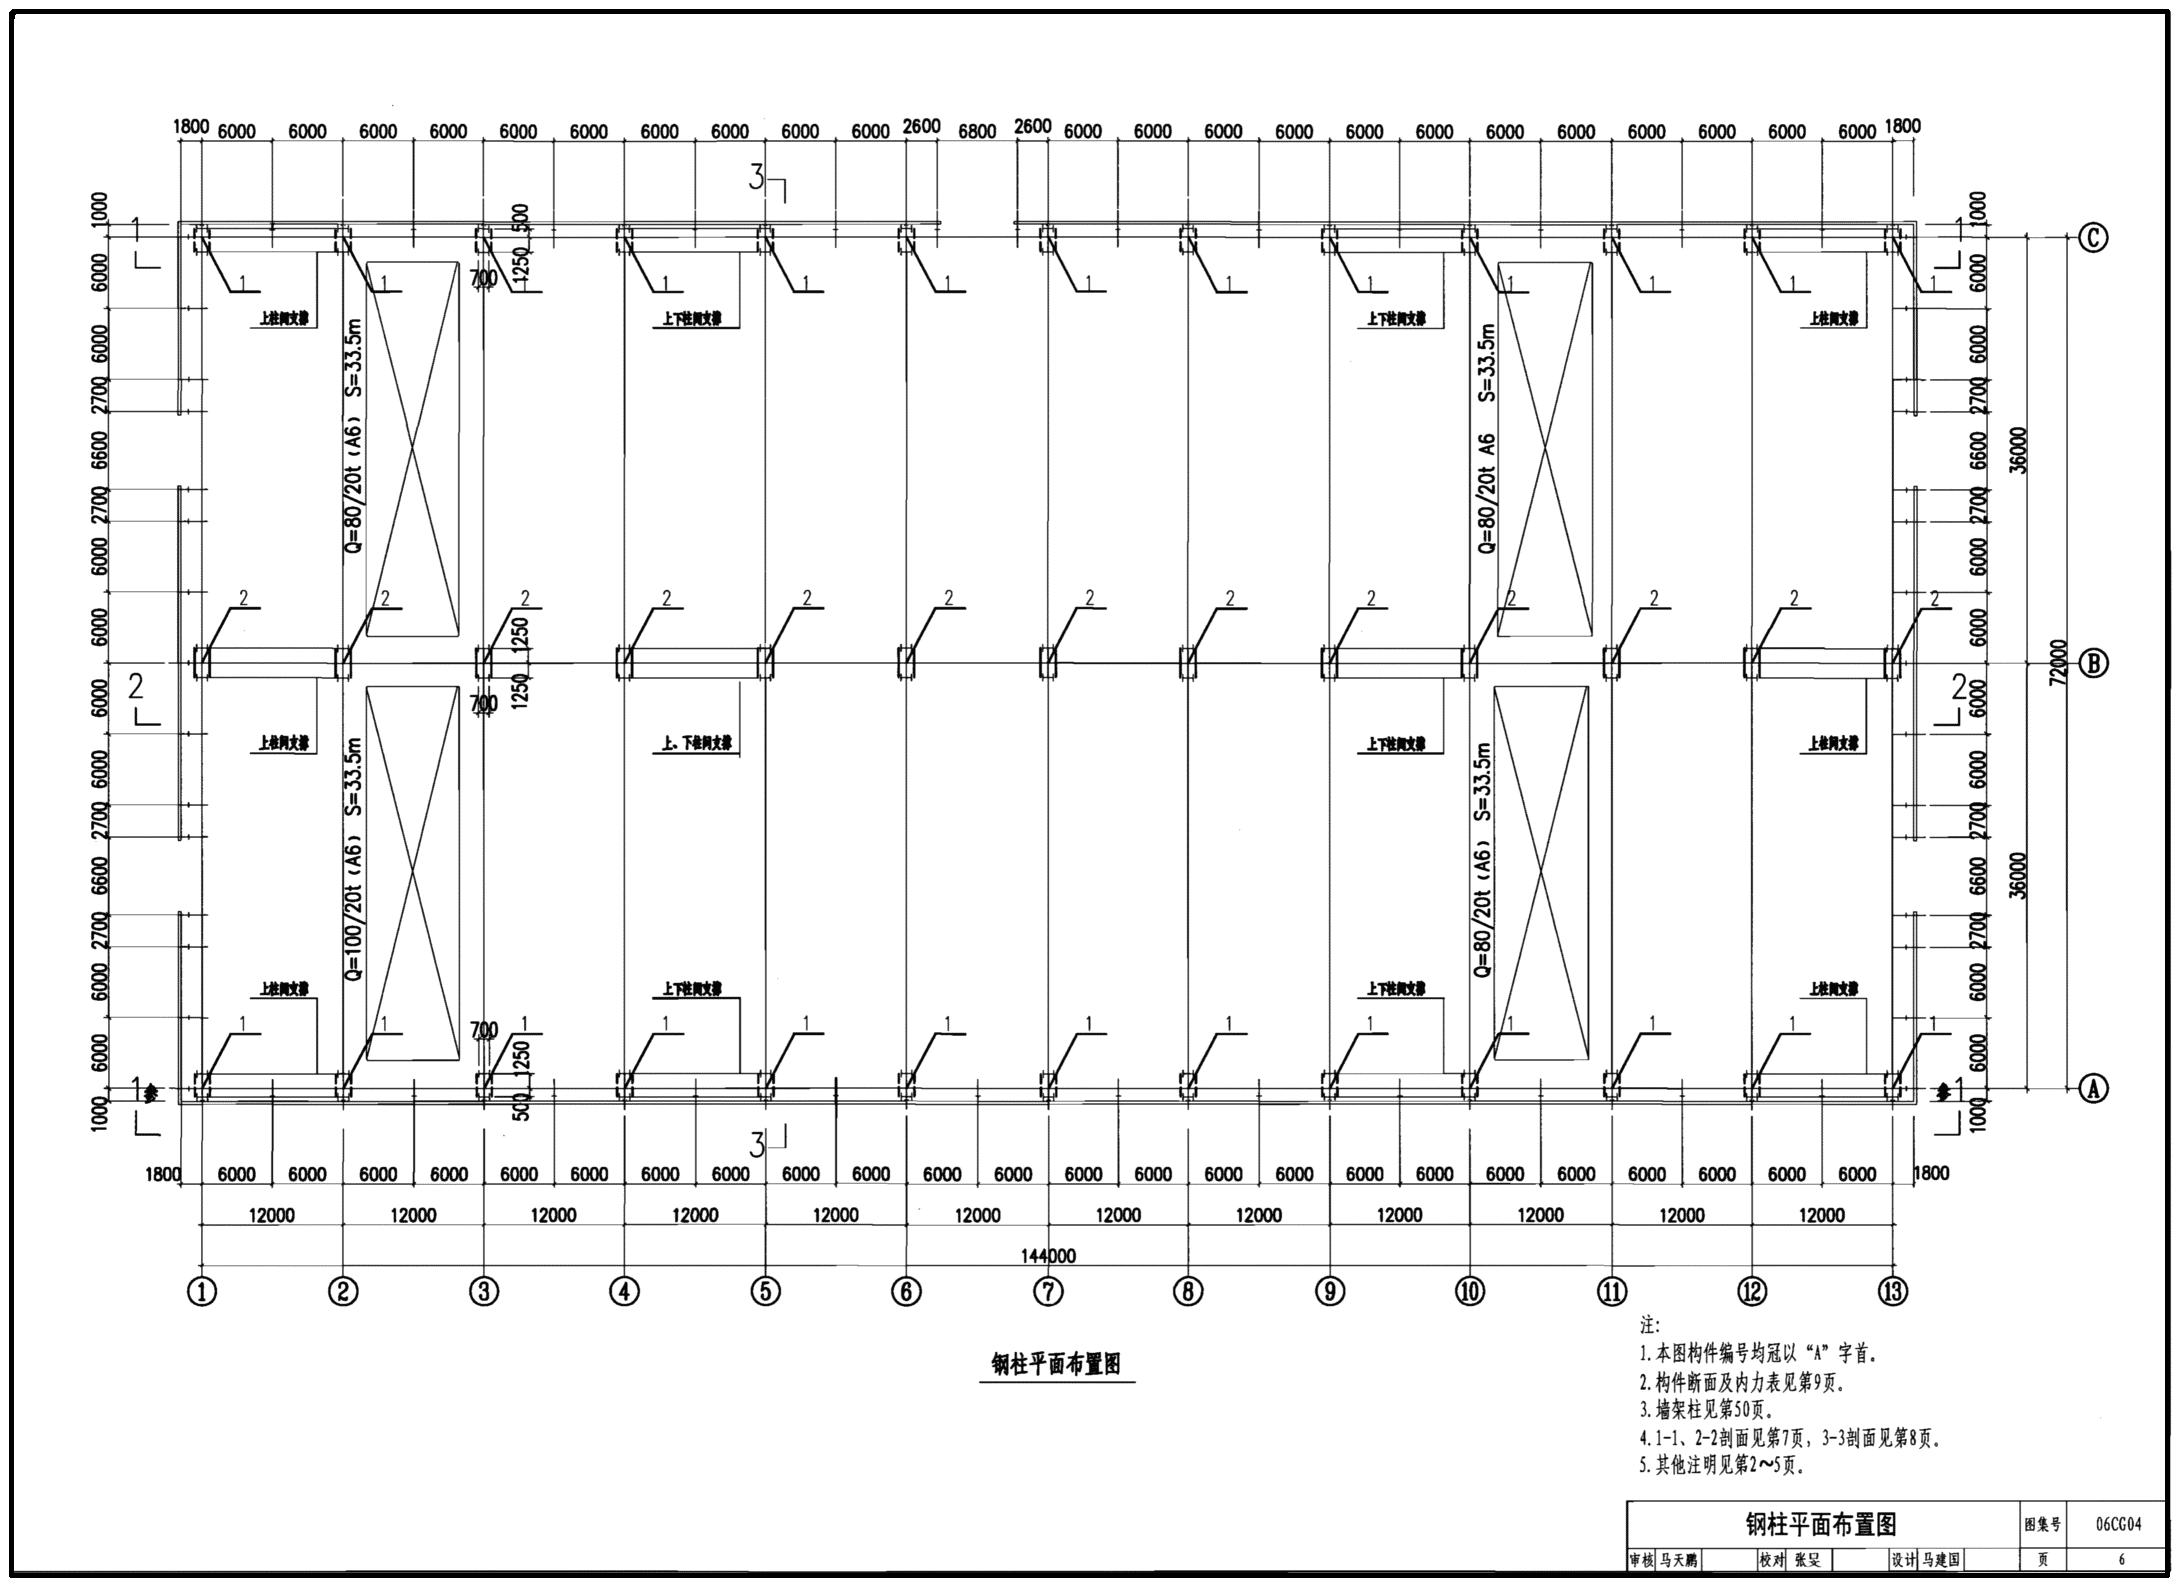 06cg04:钢结构设计示例-单层工业厂房(参考图集)